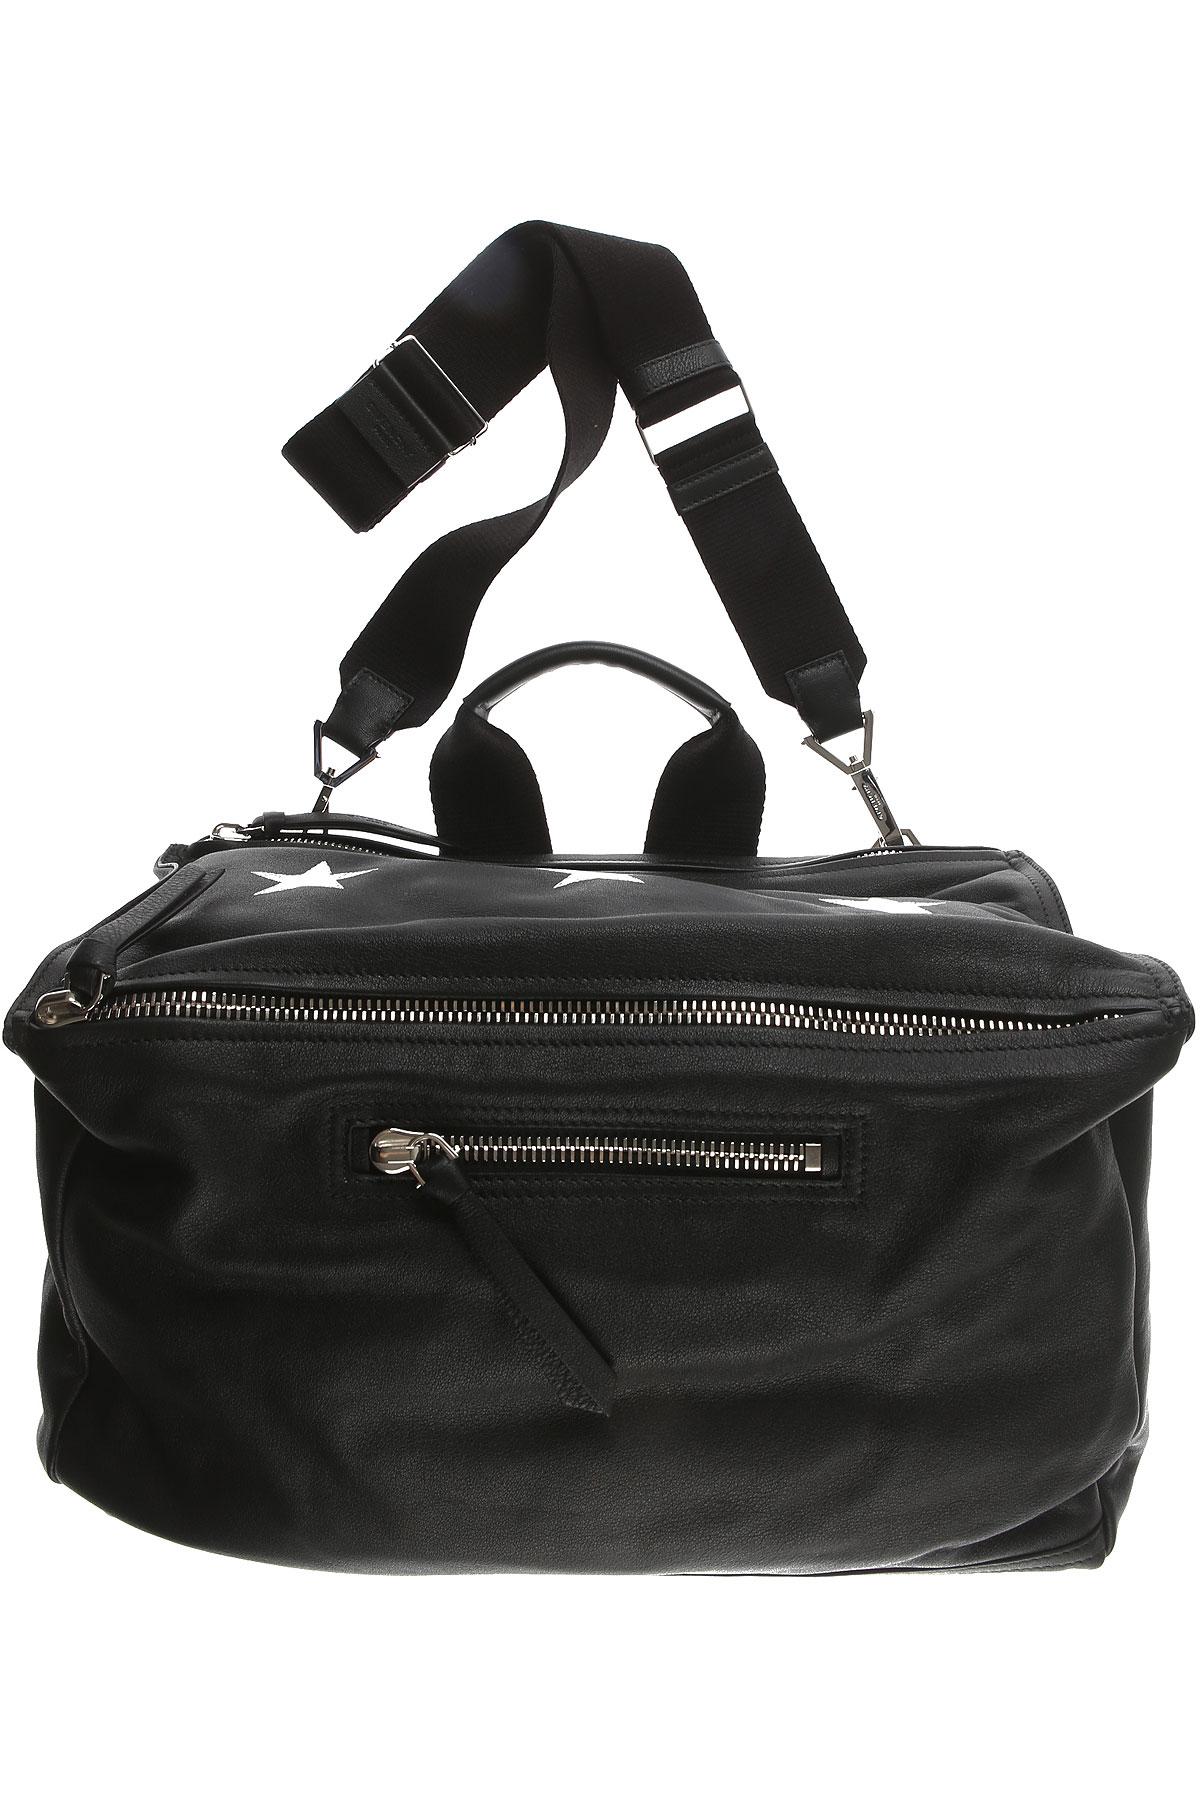 Image of Givenchy Shoulder Bags, Black, Leather, 2017